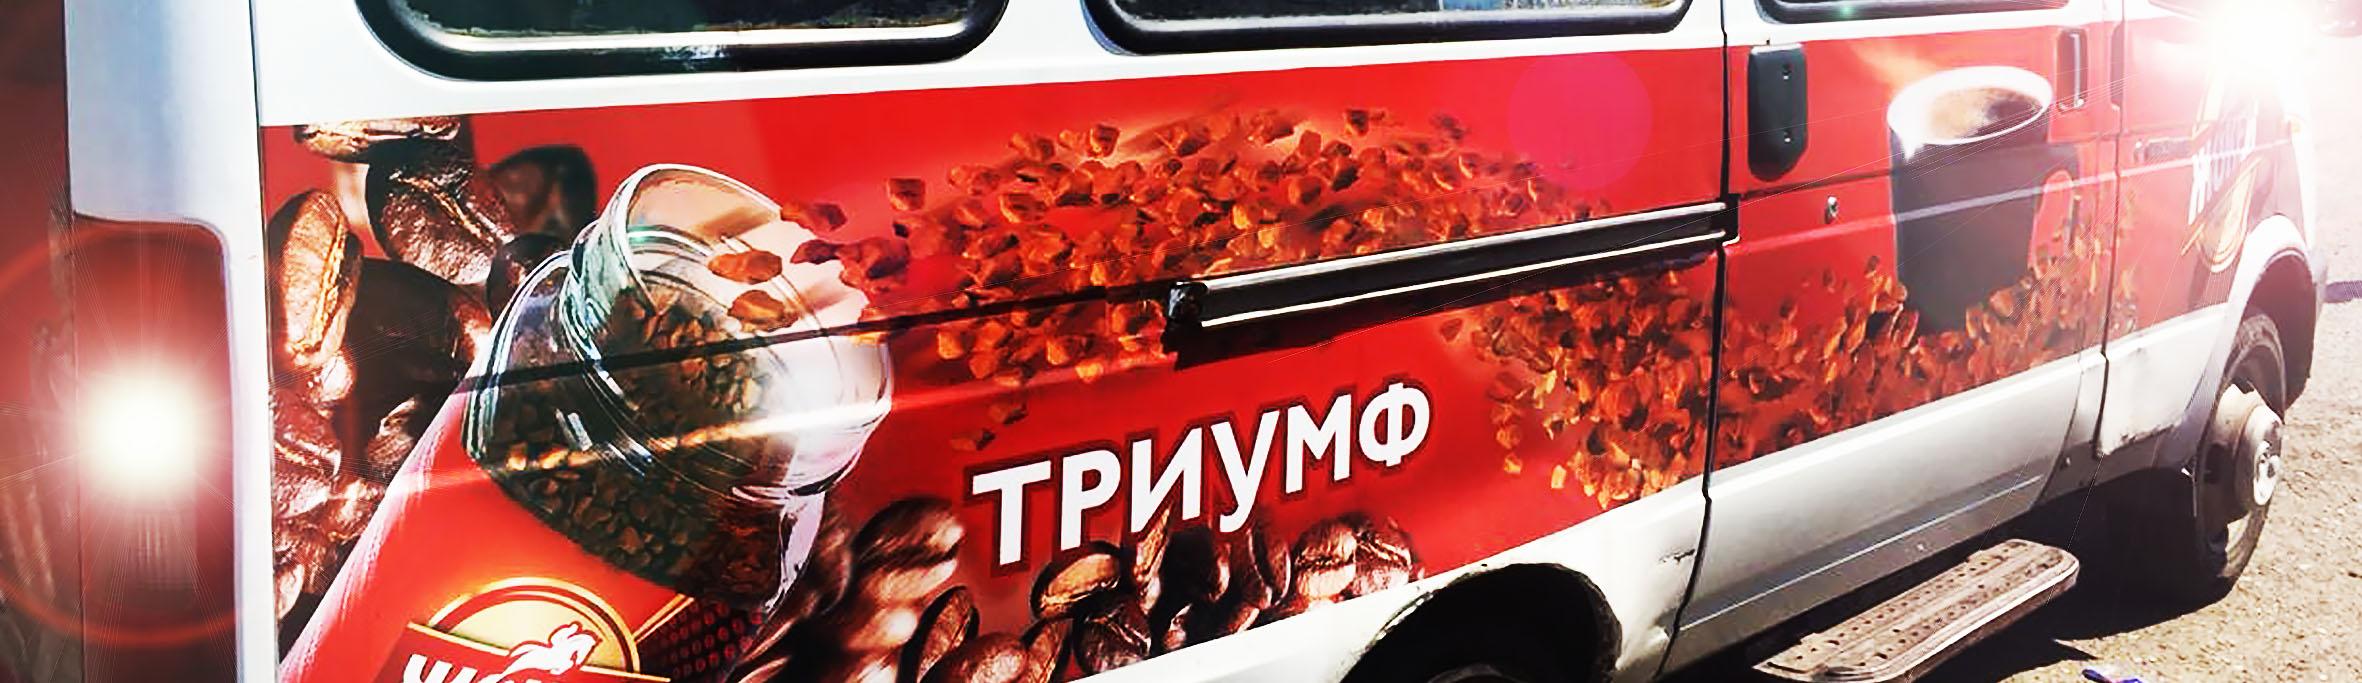 Реклама на транспорте в Прохладном КБР